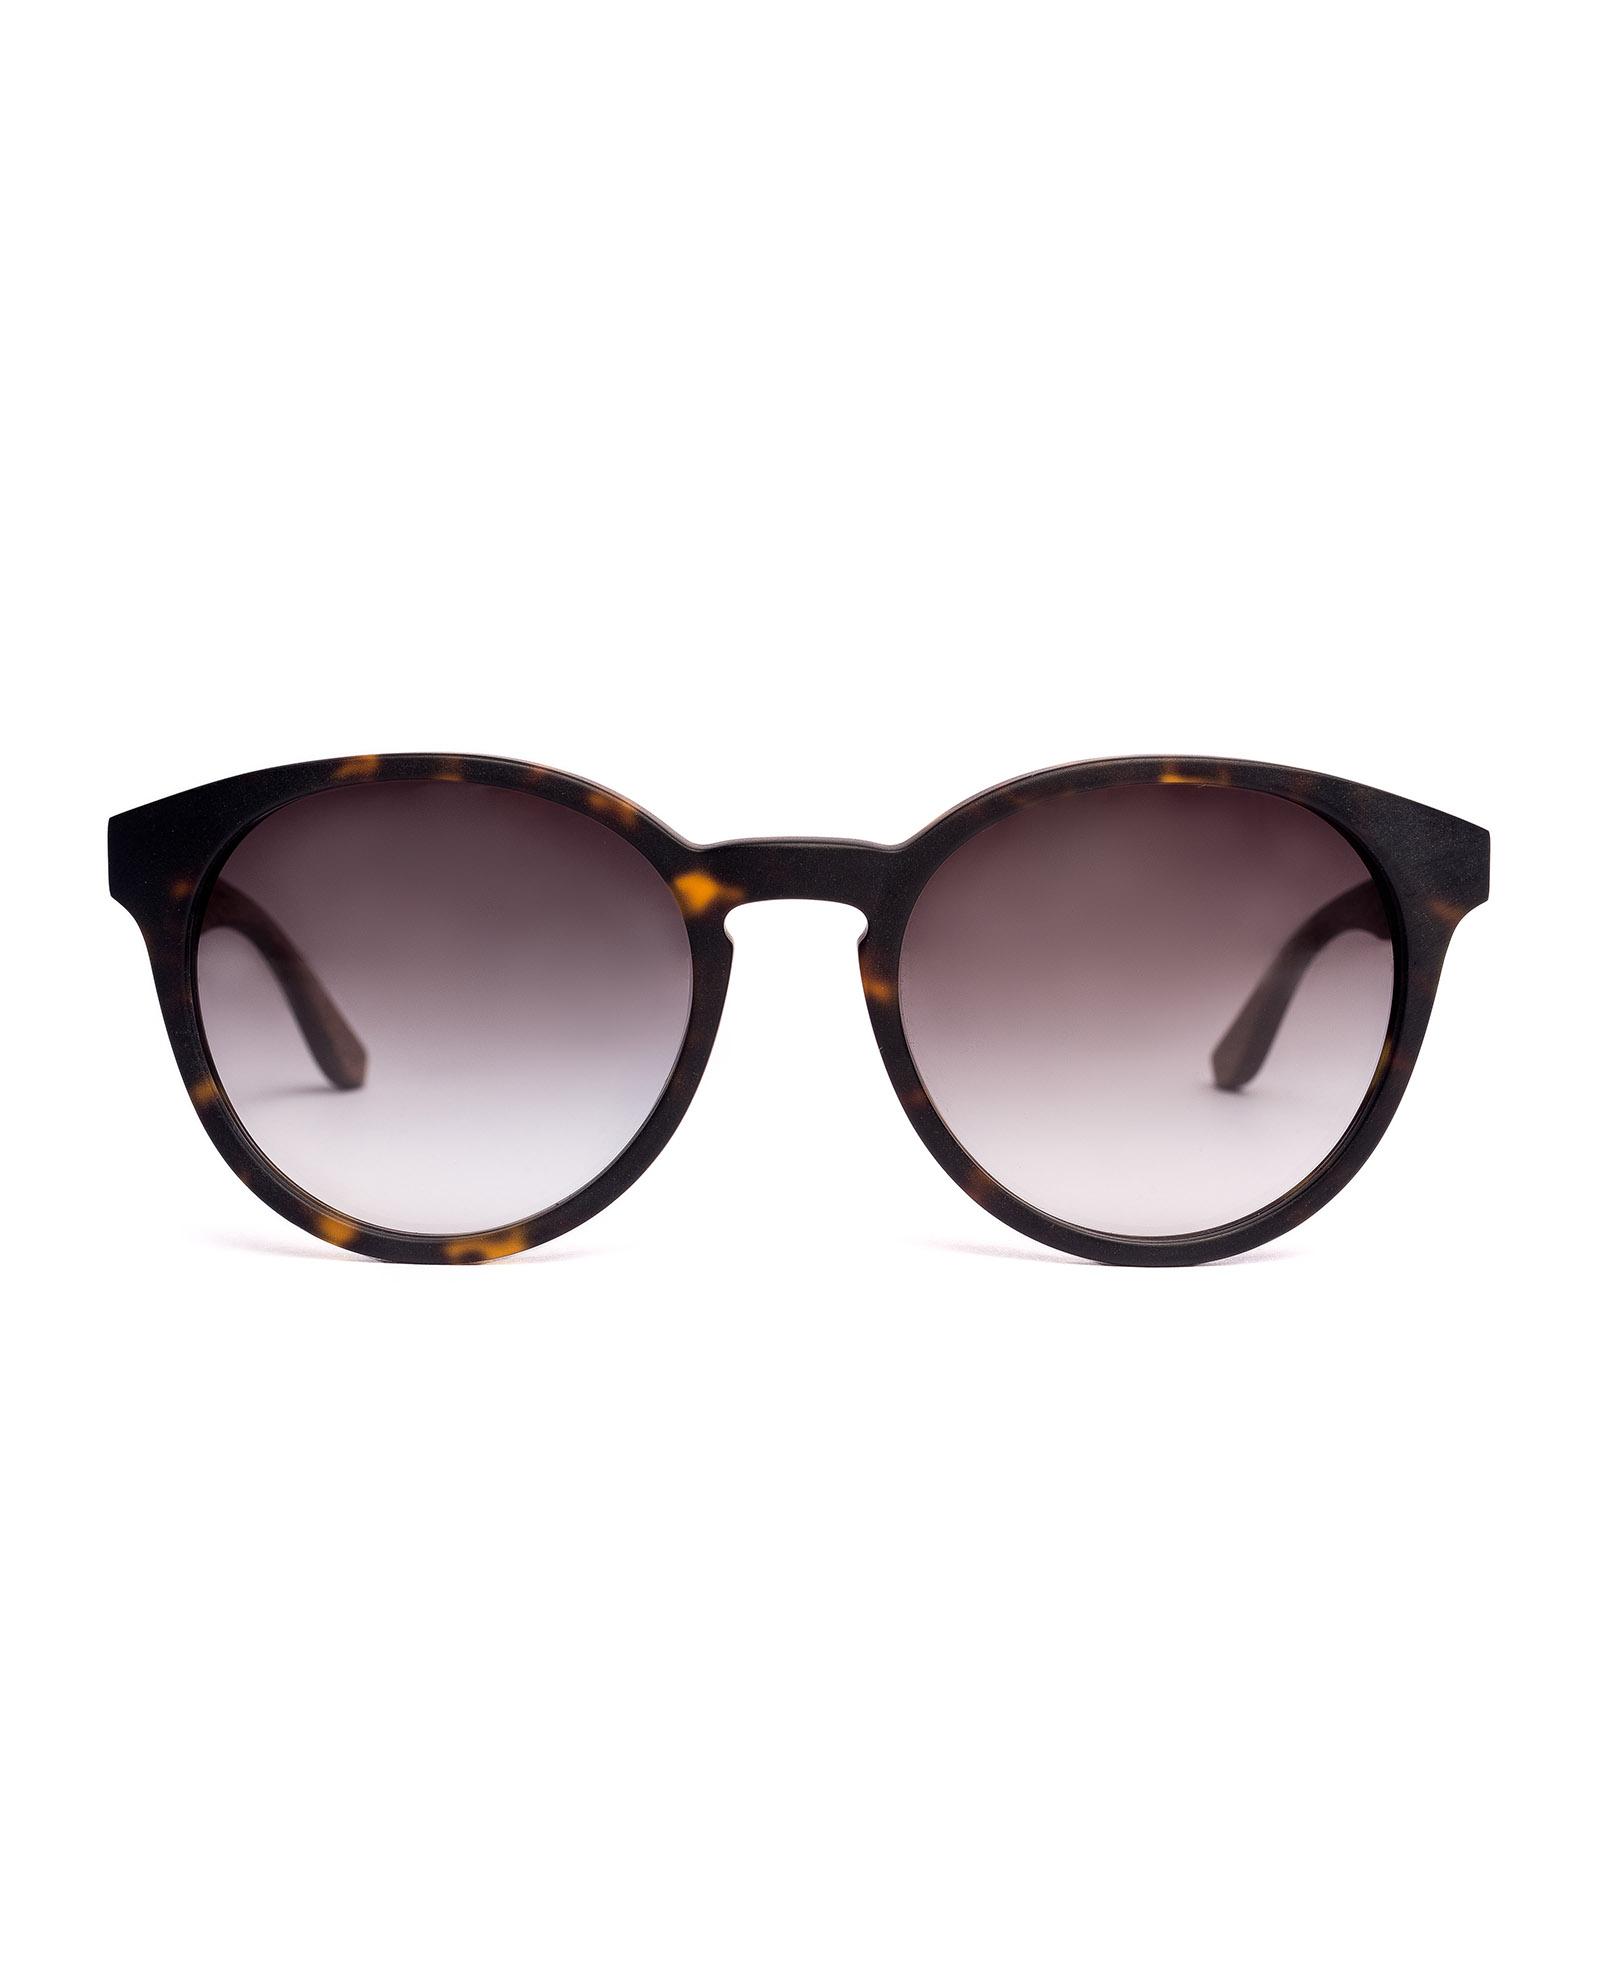 d1fc469c5f Passionate Paris - Wooden Sunglasses - Woodiu